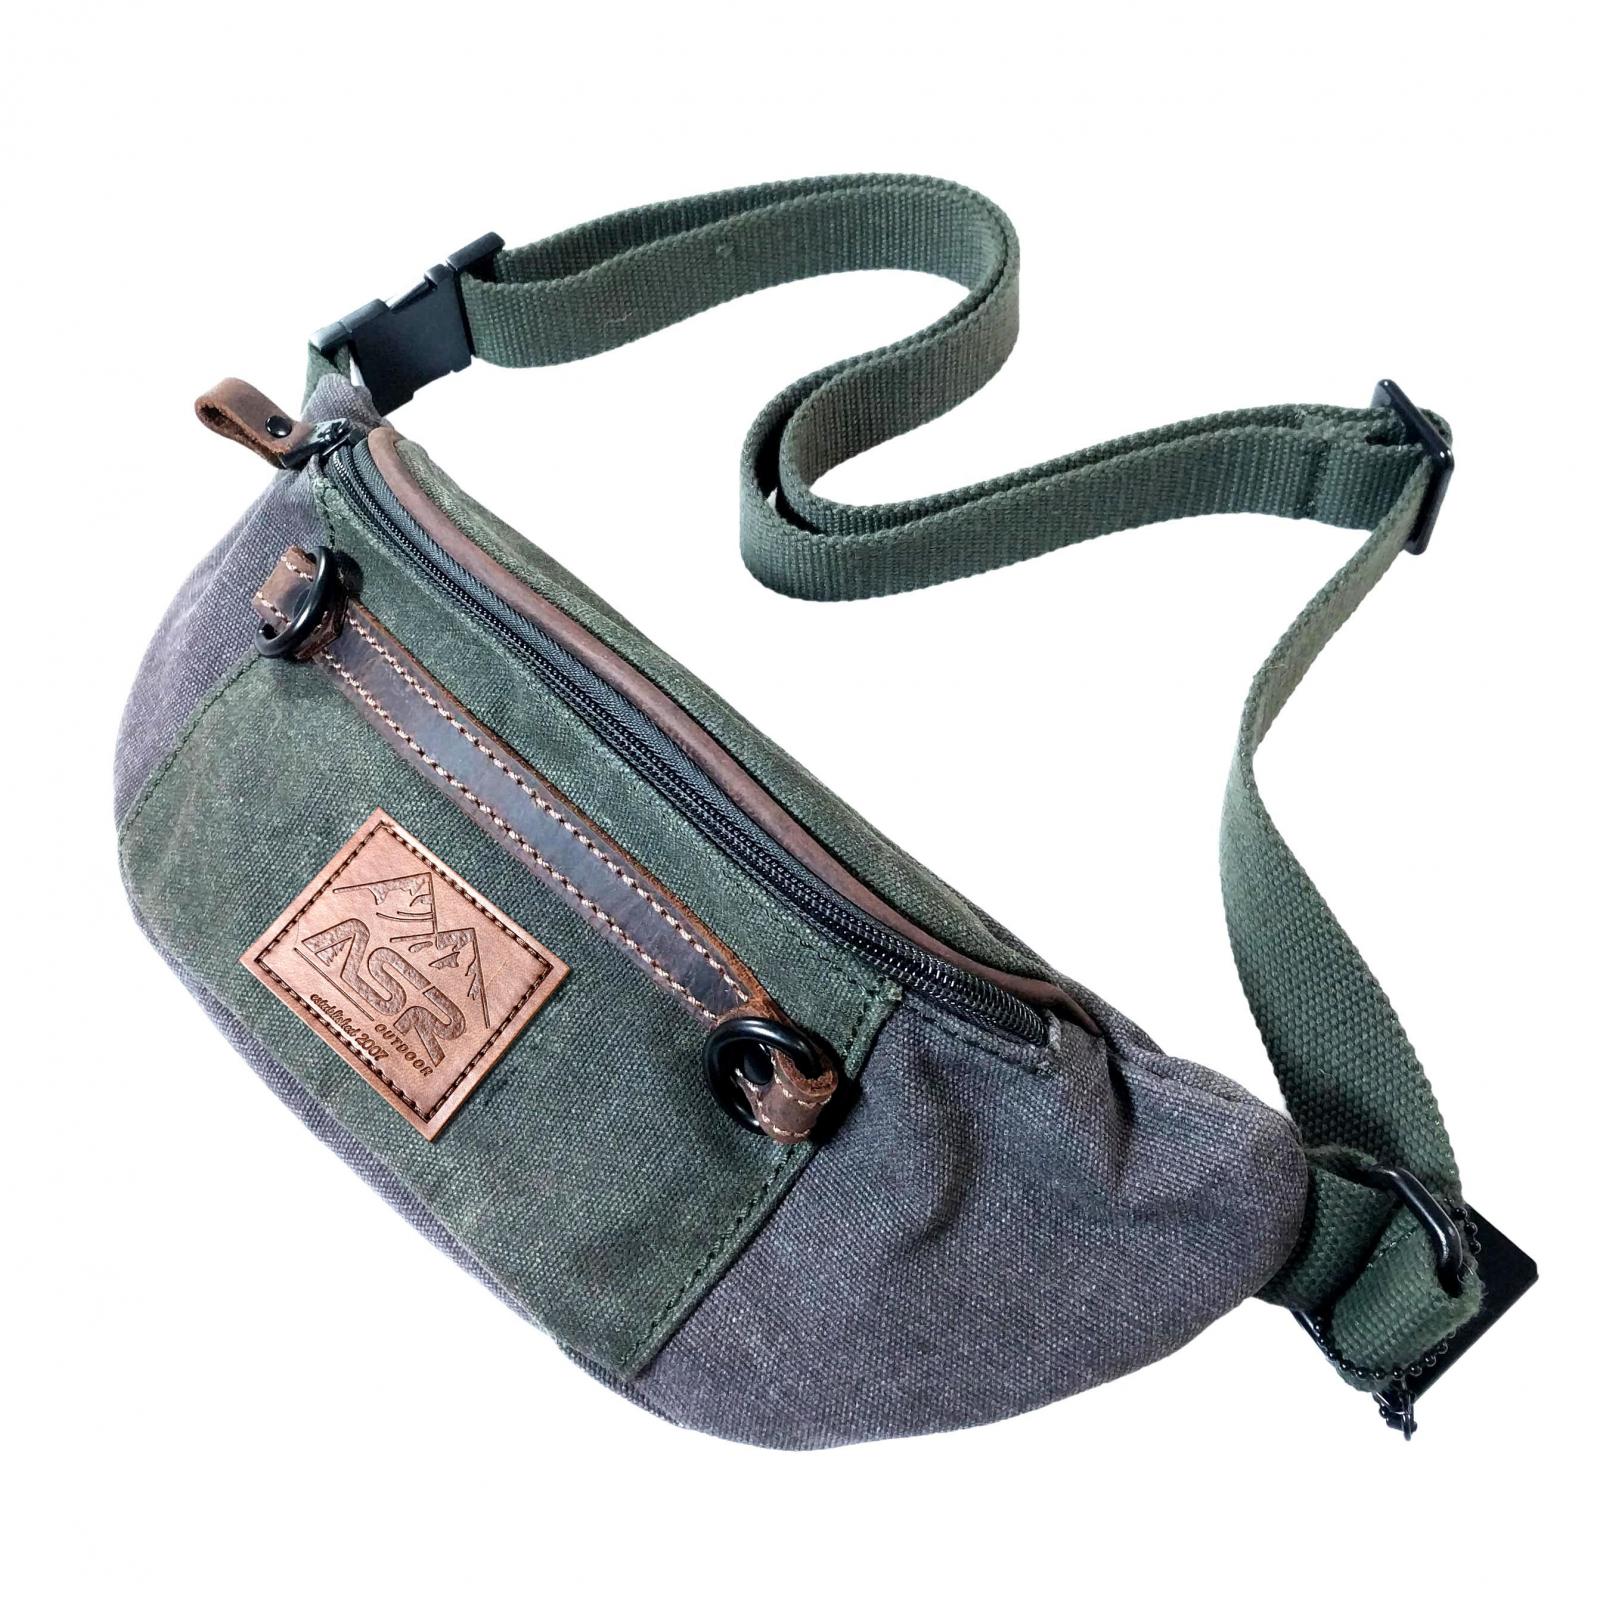 ASR Outdoor Man Pack Fanny Waist Bag Water Resistant - Green